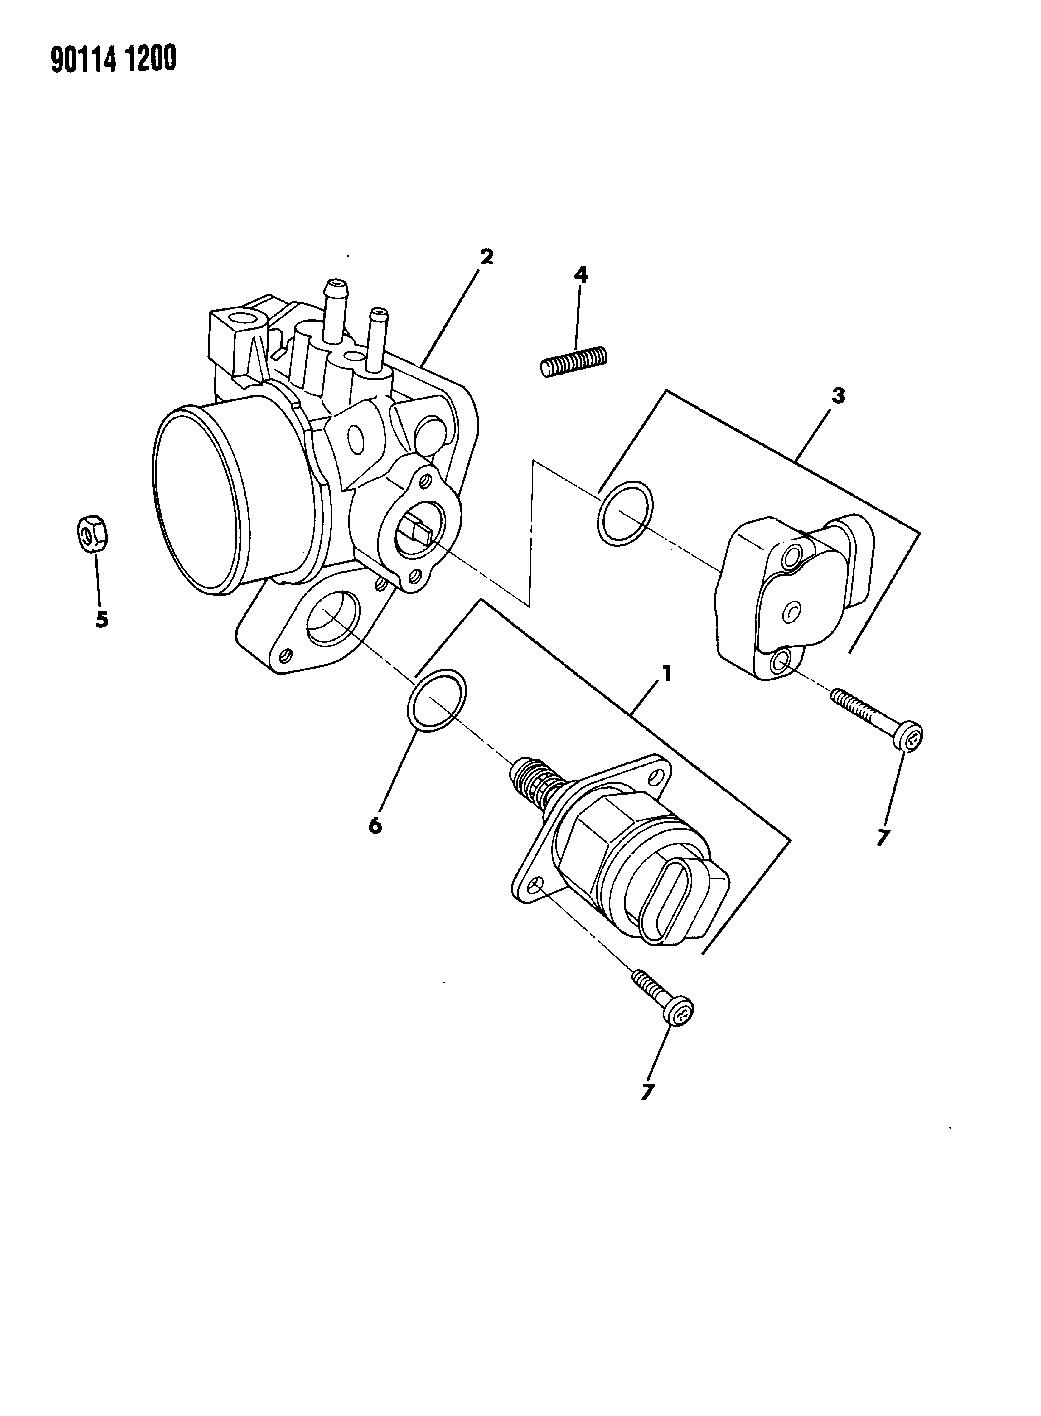 1990 Dodge Dynasty Throttle Body Mopar Parts Giant Schematic Diagram 2